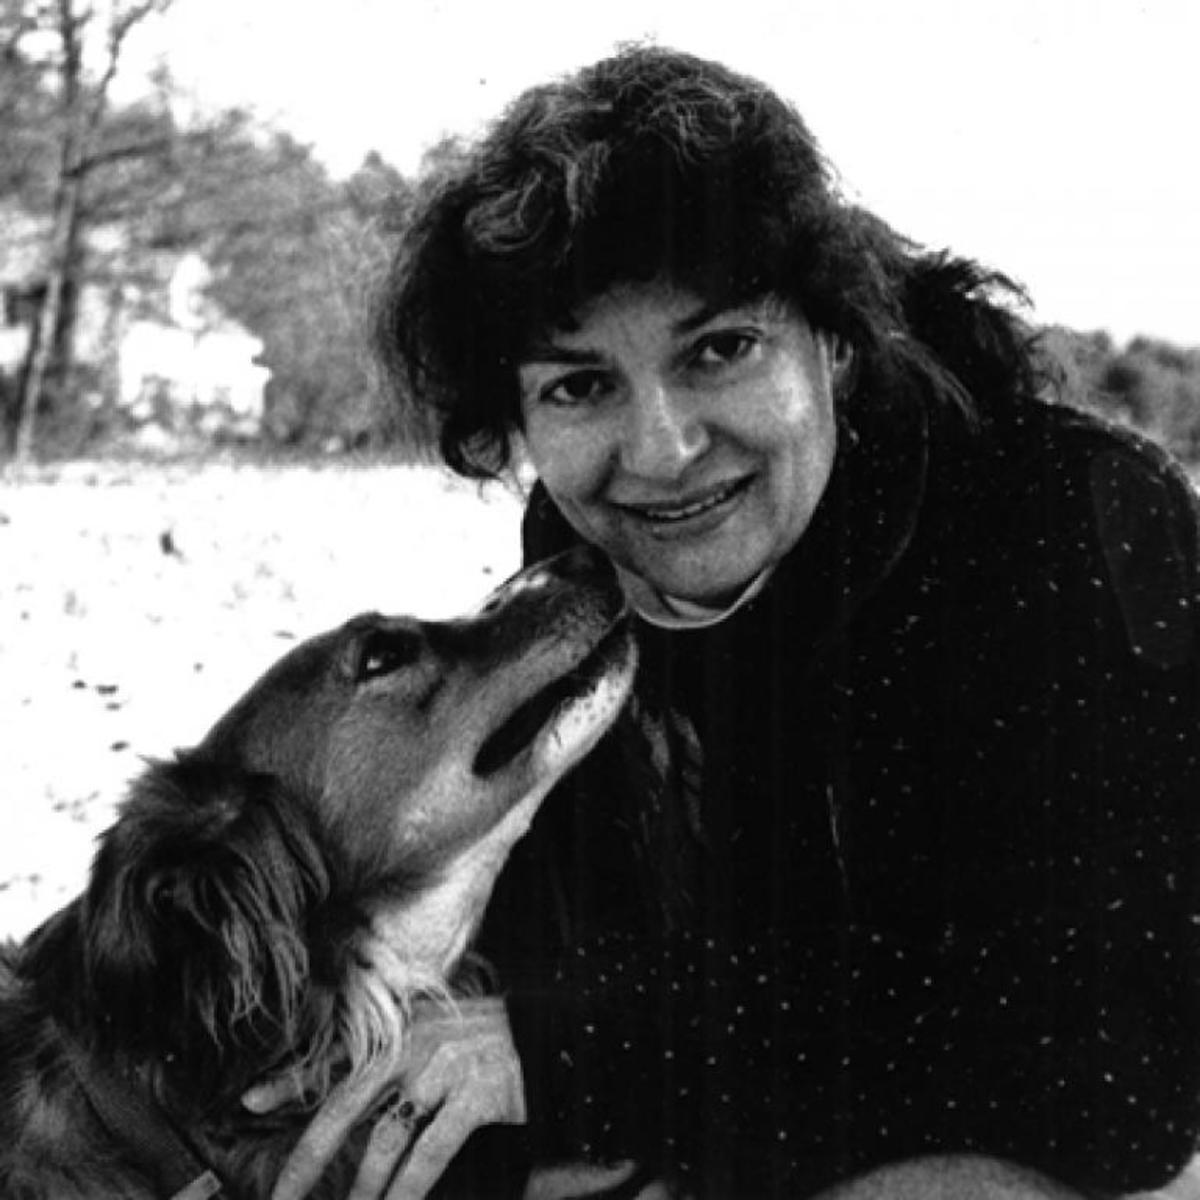 Analysis of Poem The Blue Bowl by Jane Kenyon